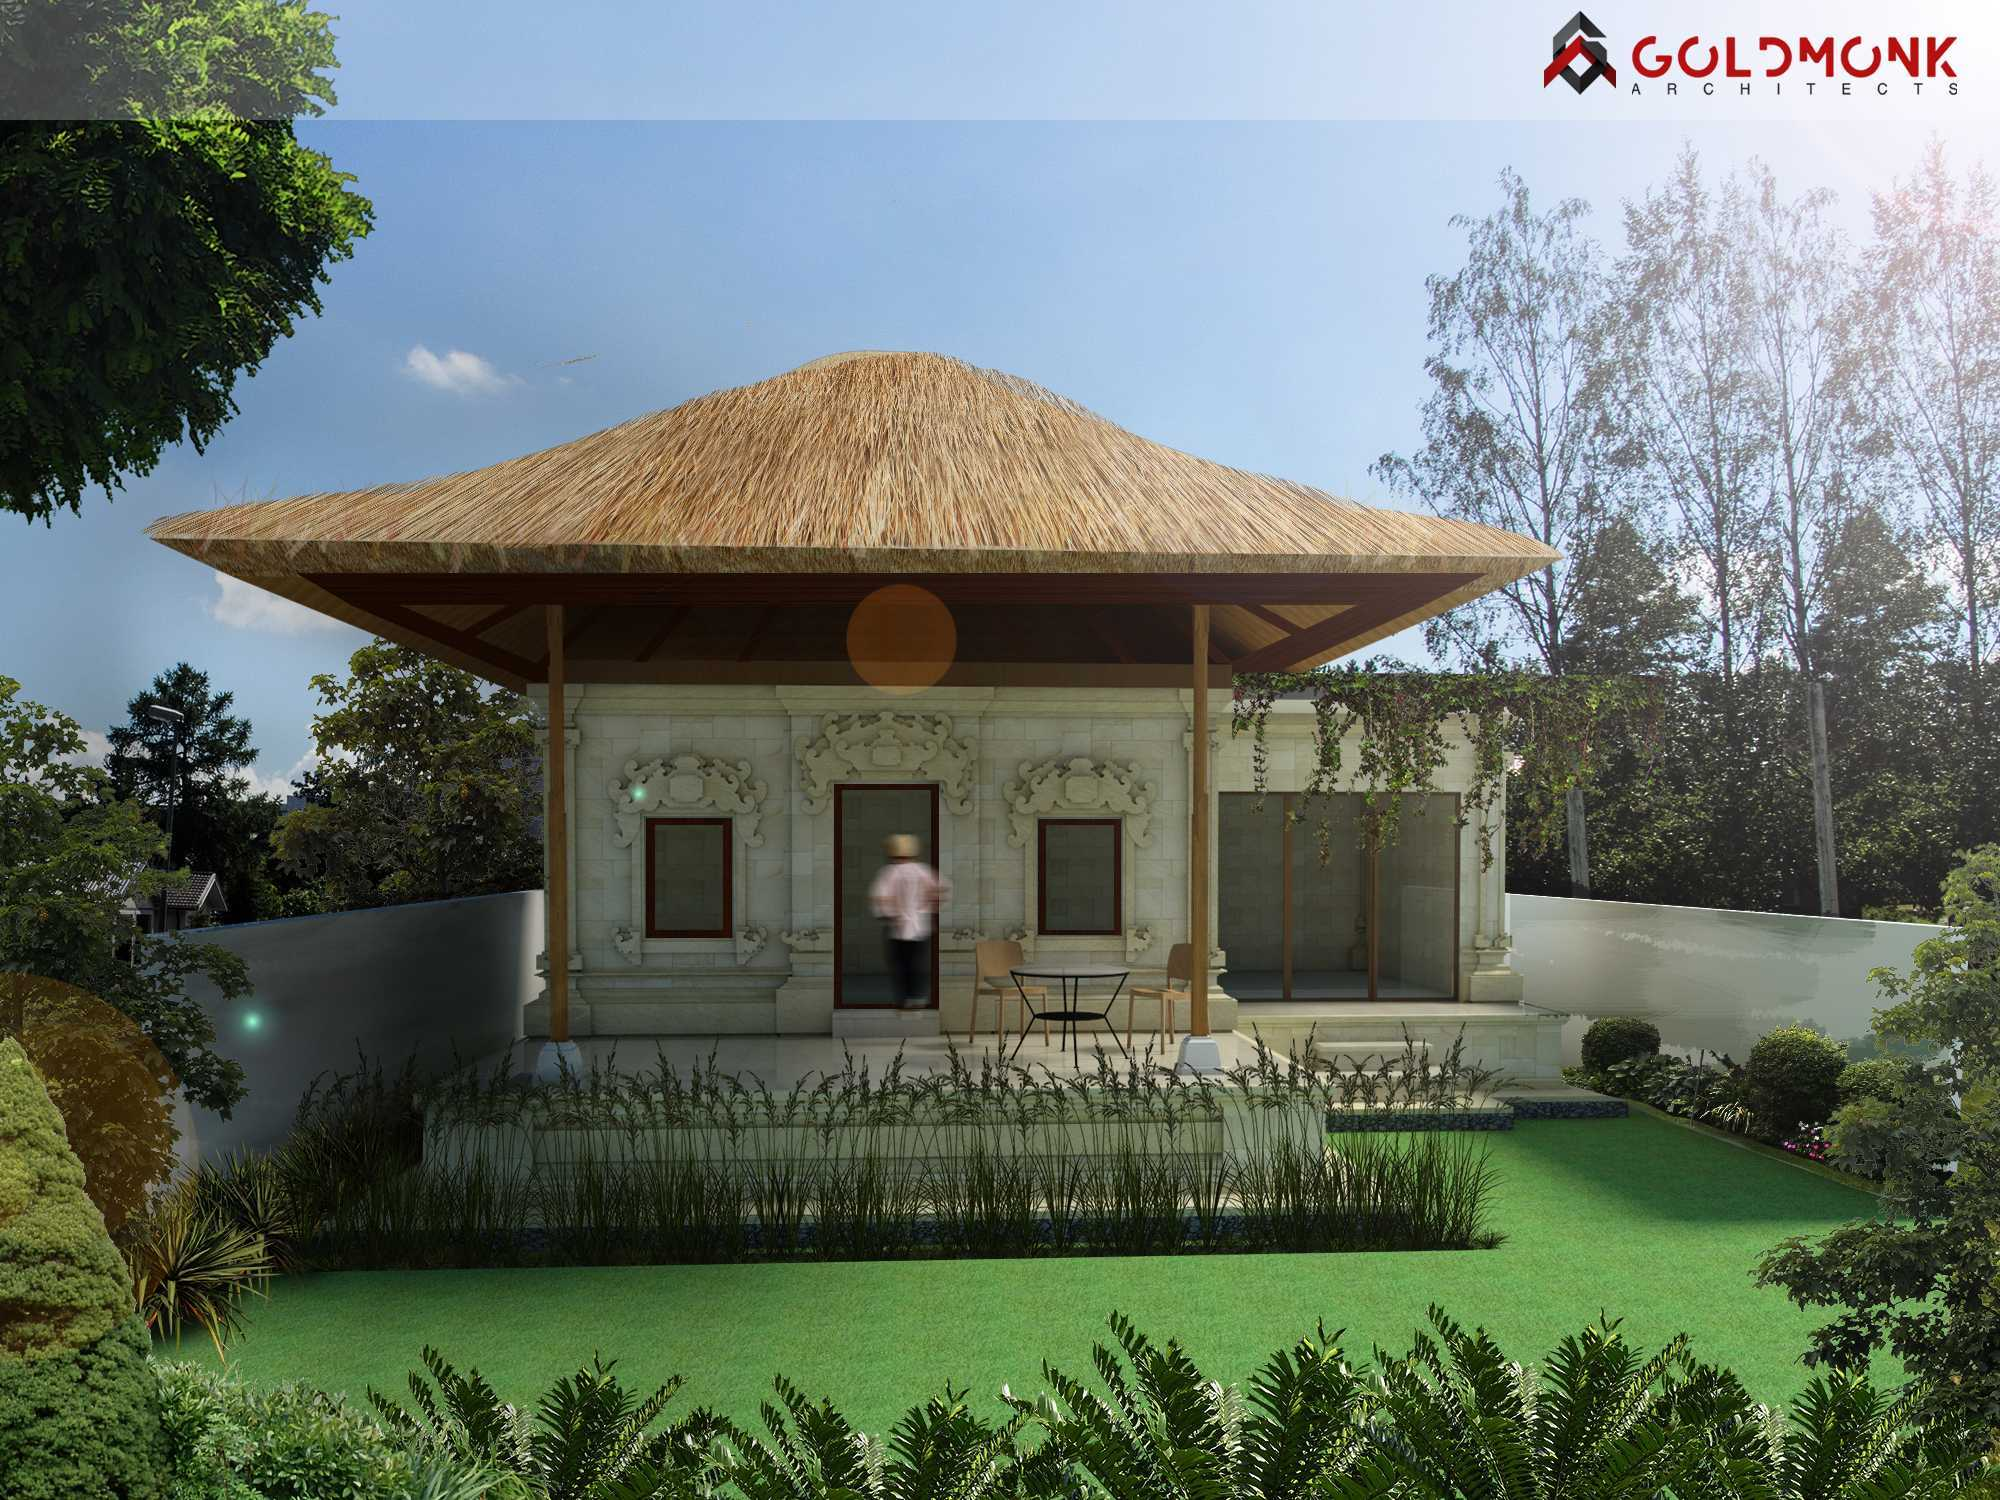 Goldmonk Architects Sembung Villa Sembung, Mengwi, Kabupaten Badung, Bali, Indonesia Sembung, Mengwi, Kabupaten Badung, Bali, Indonesia Goldmonk-Architects-Sembung-Villa  60337